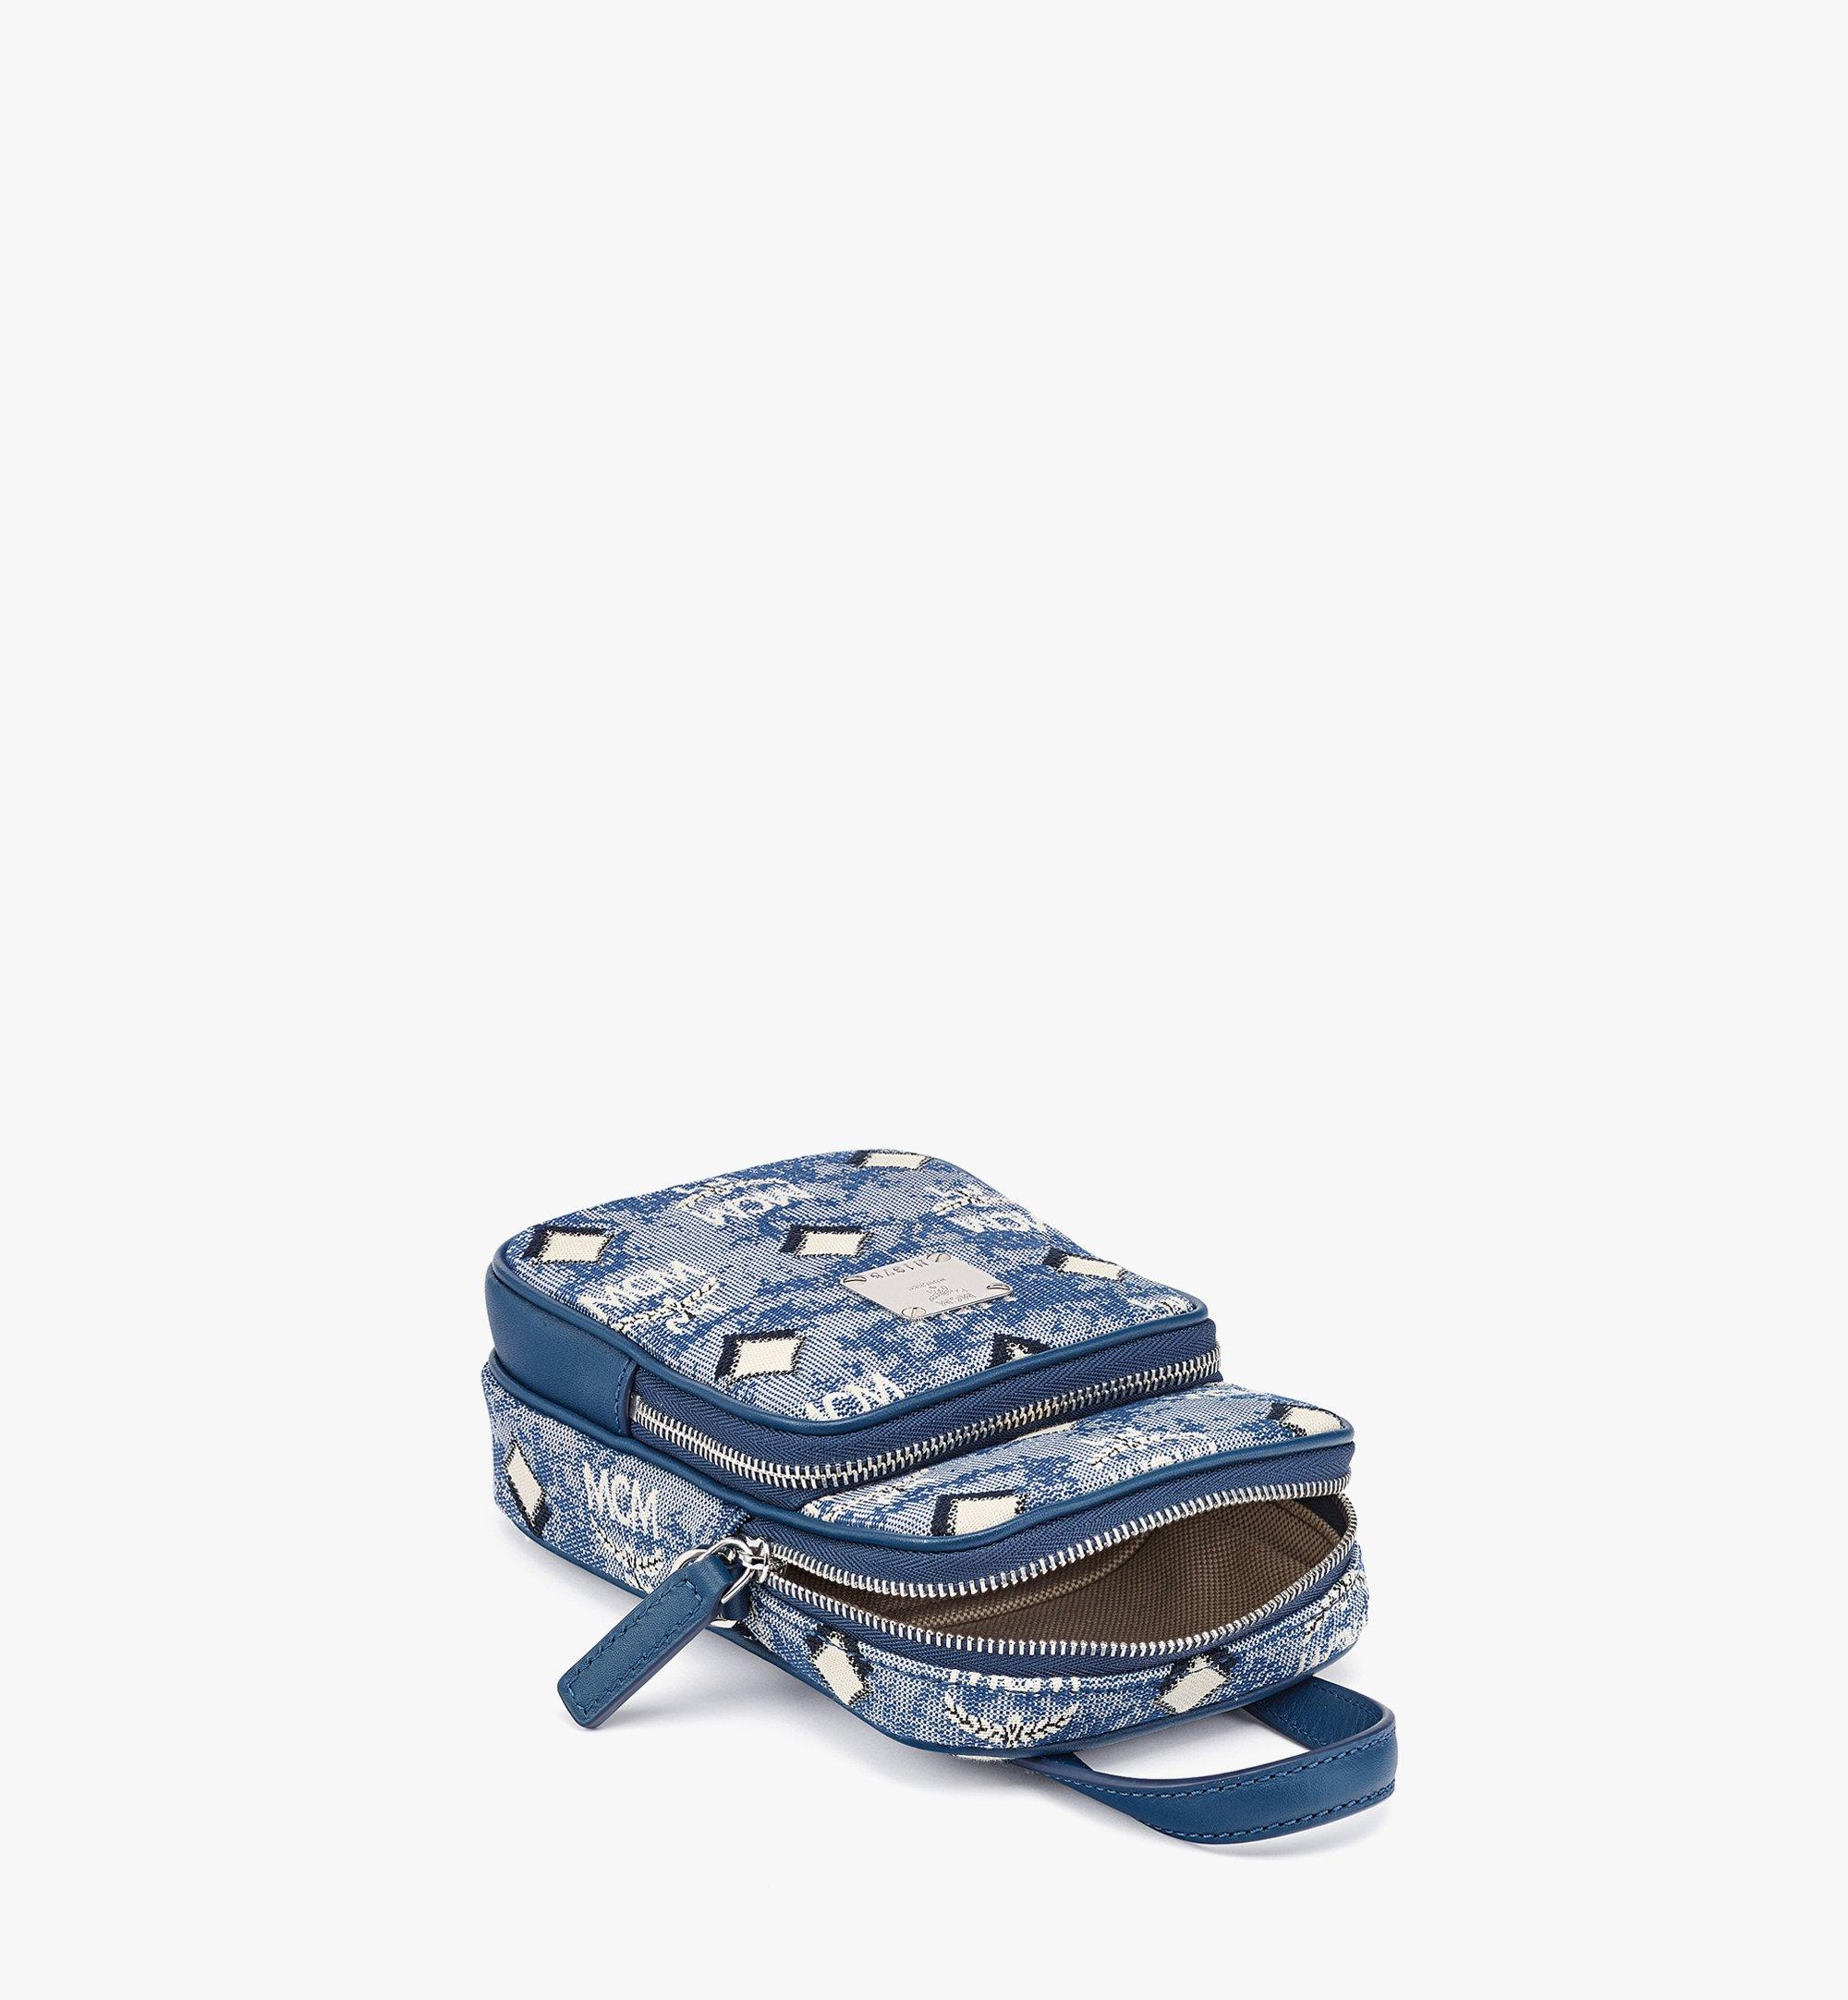 MCM N/S Crossbody Bag in Vintage Jacquard Monogram Blue MMRBATQ02LU001 Alternate View 2